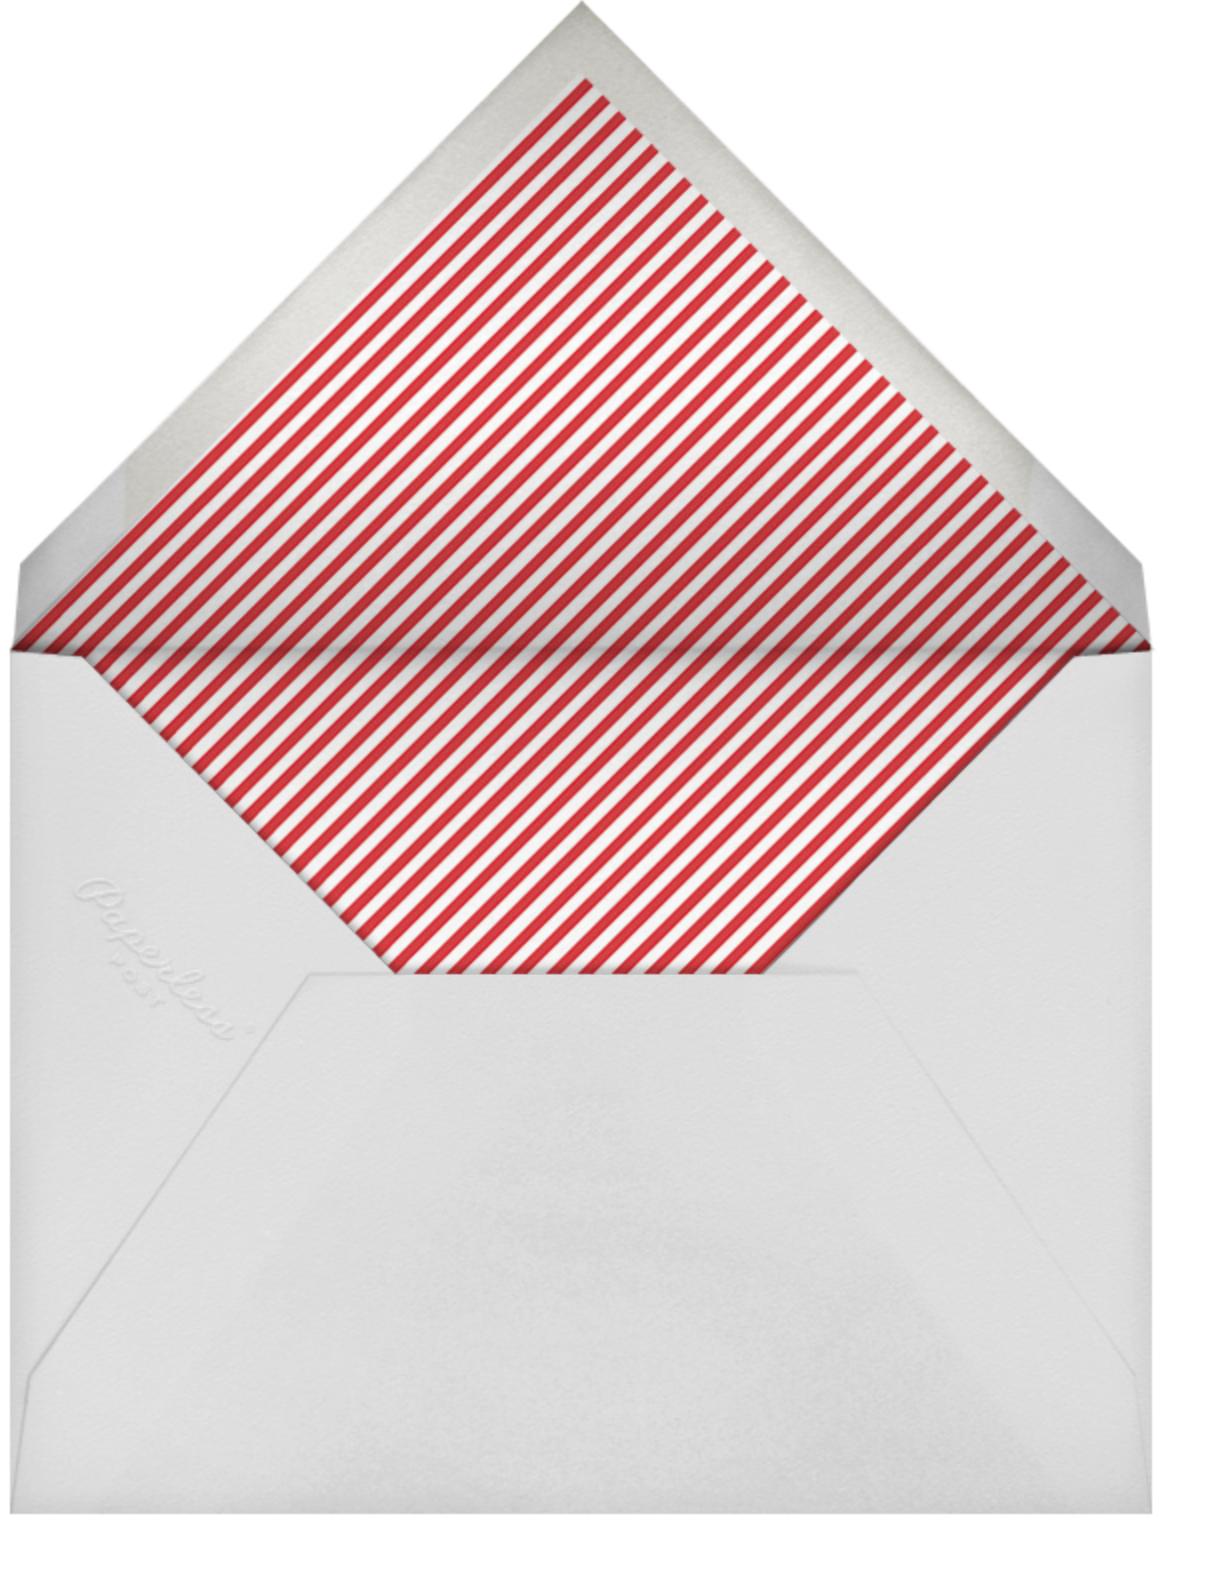 Balloons - Red - Linda and Harriett - Adult birthday - envelope back